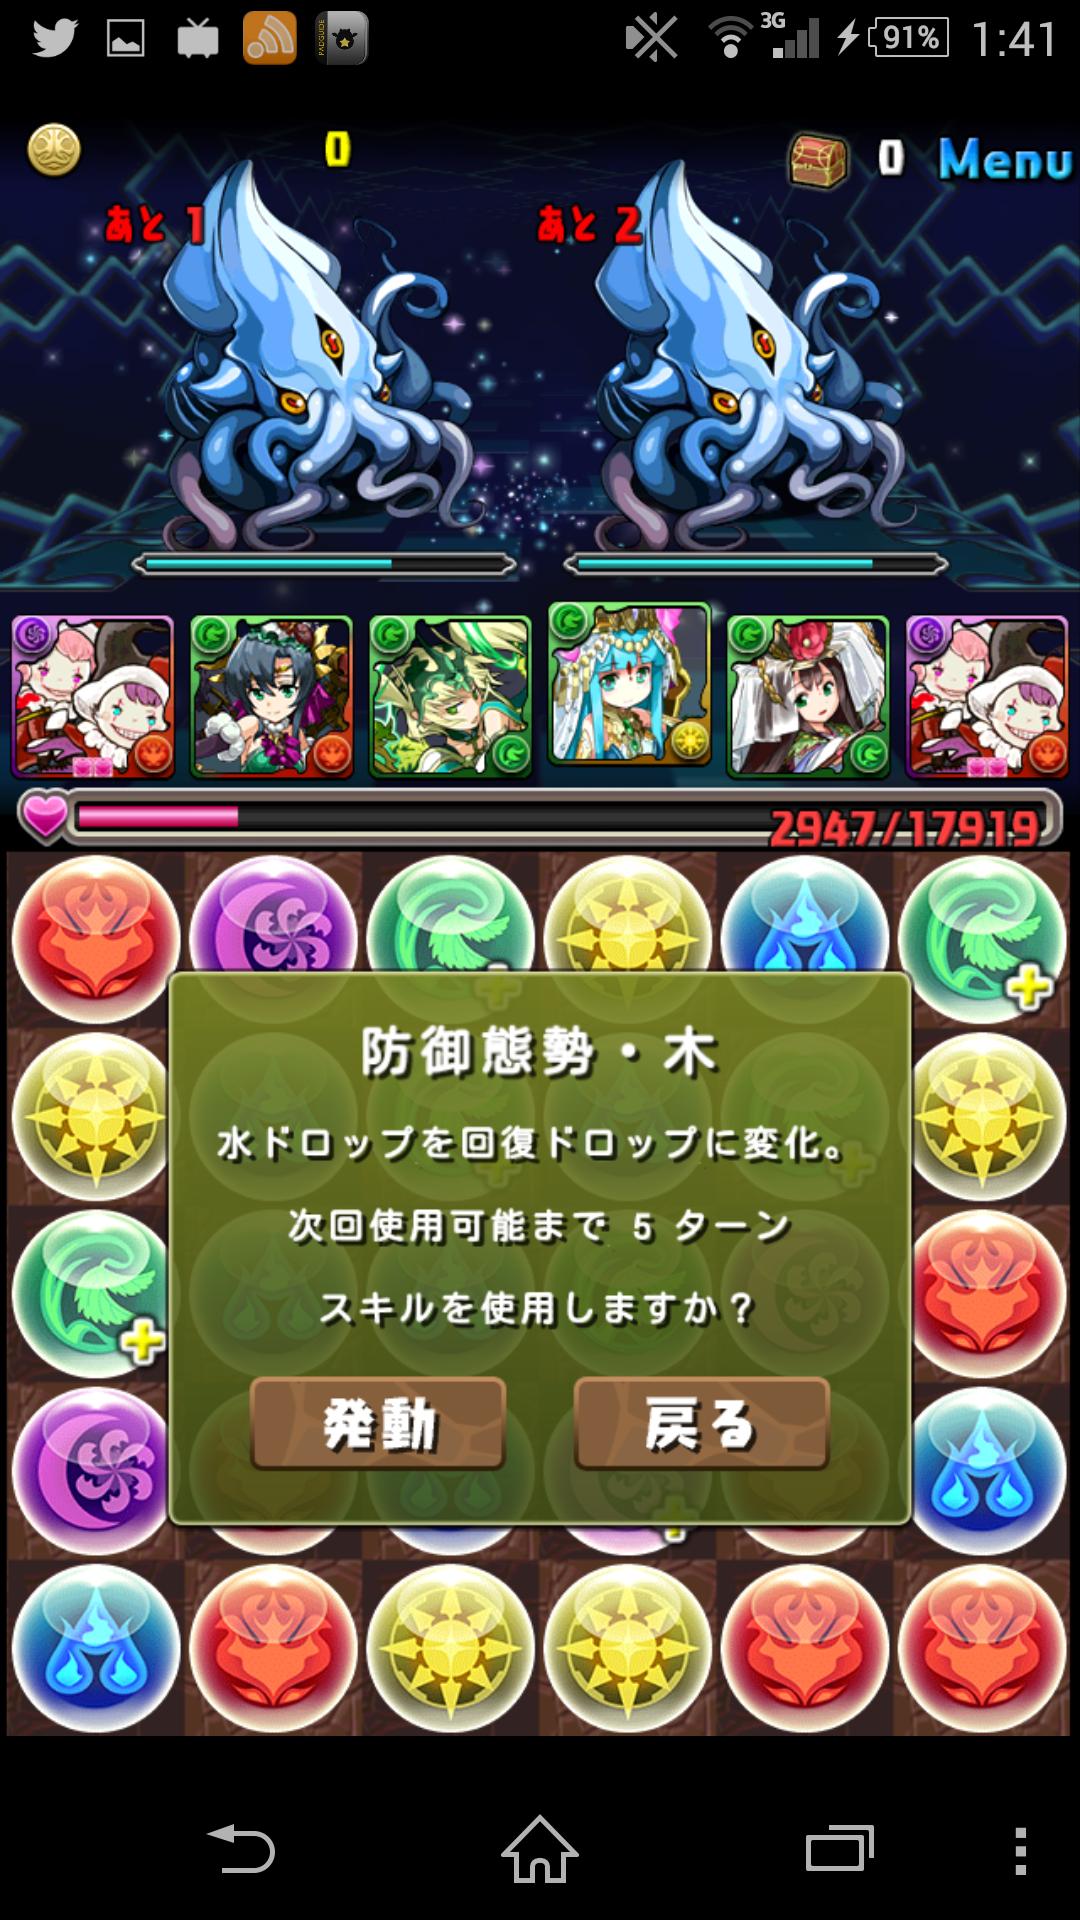 Screenshot_2015-03-04-01-41-35.png